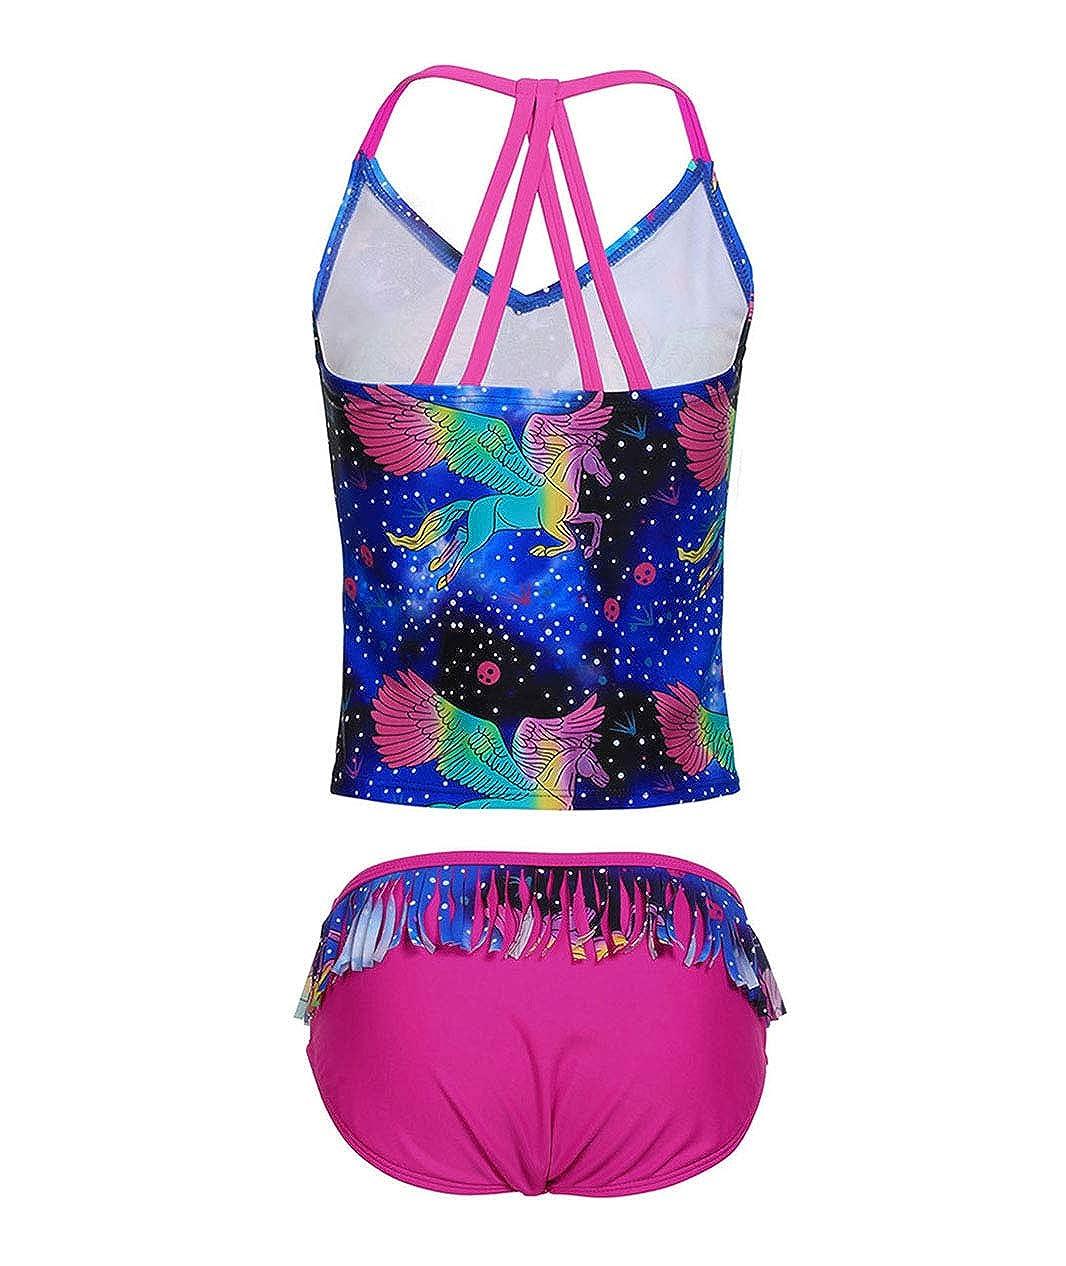 BELLOO Girls Cross Straps Two Piece Tankini Swimsuit